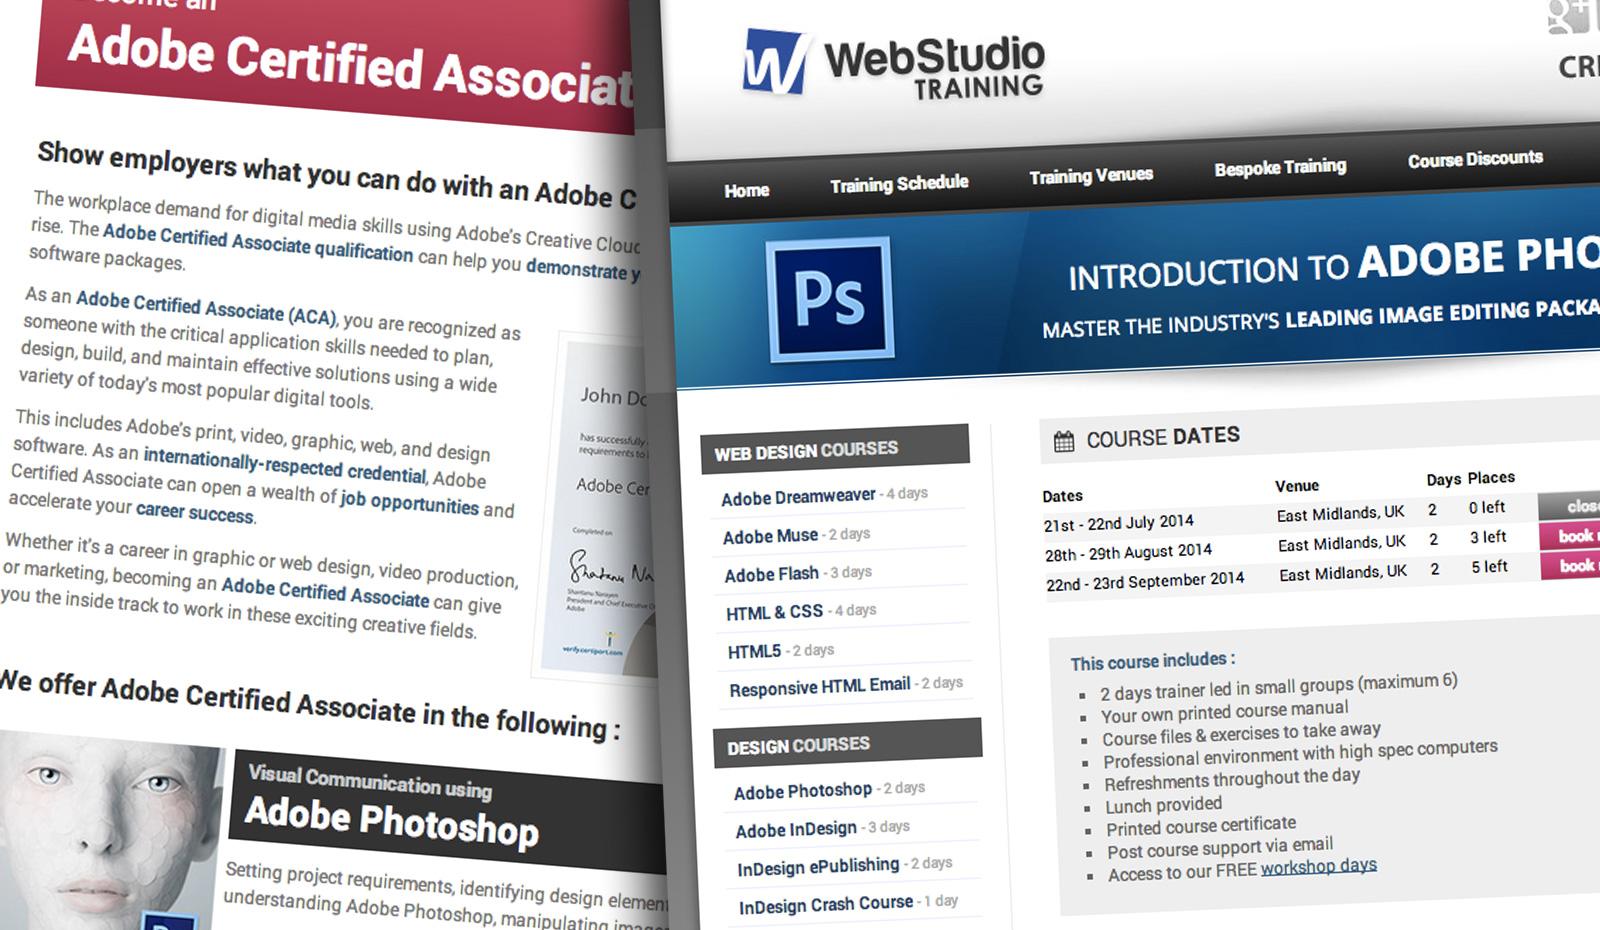 WebStudio Training